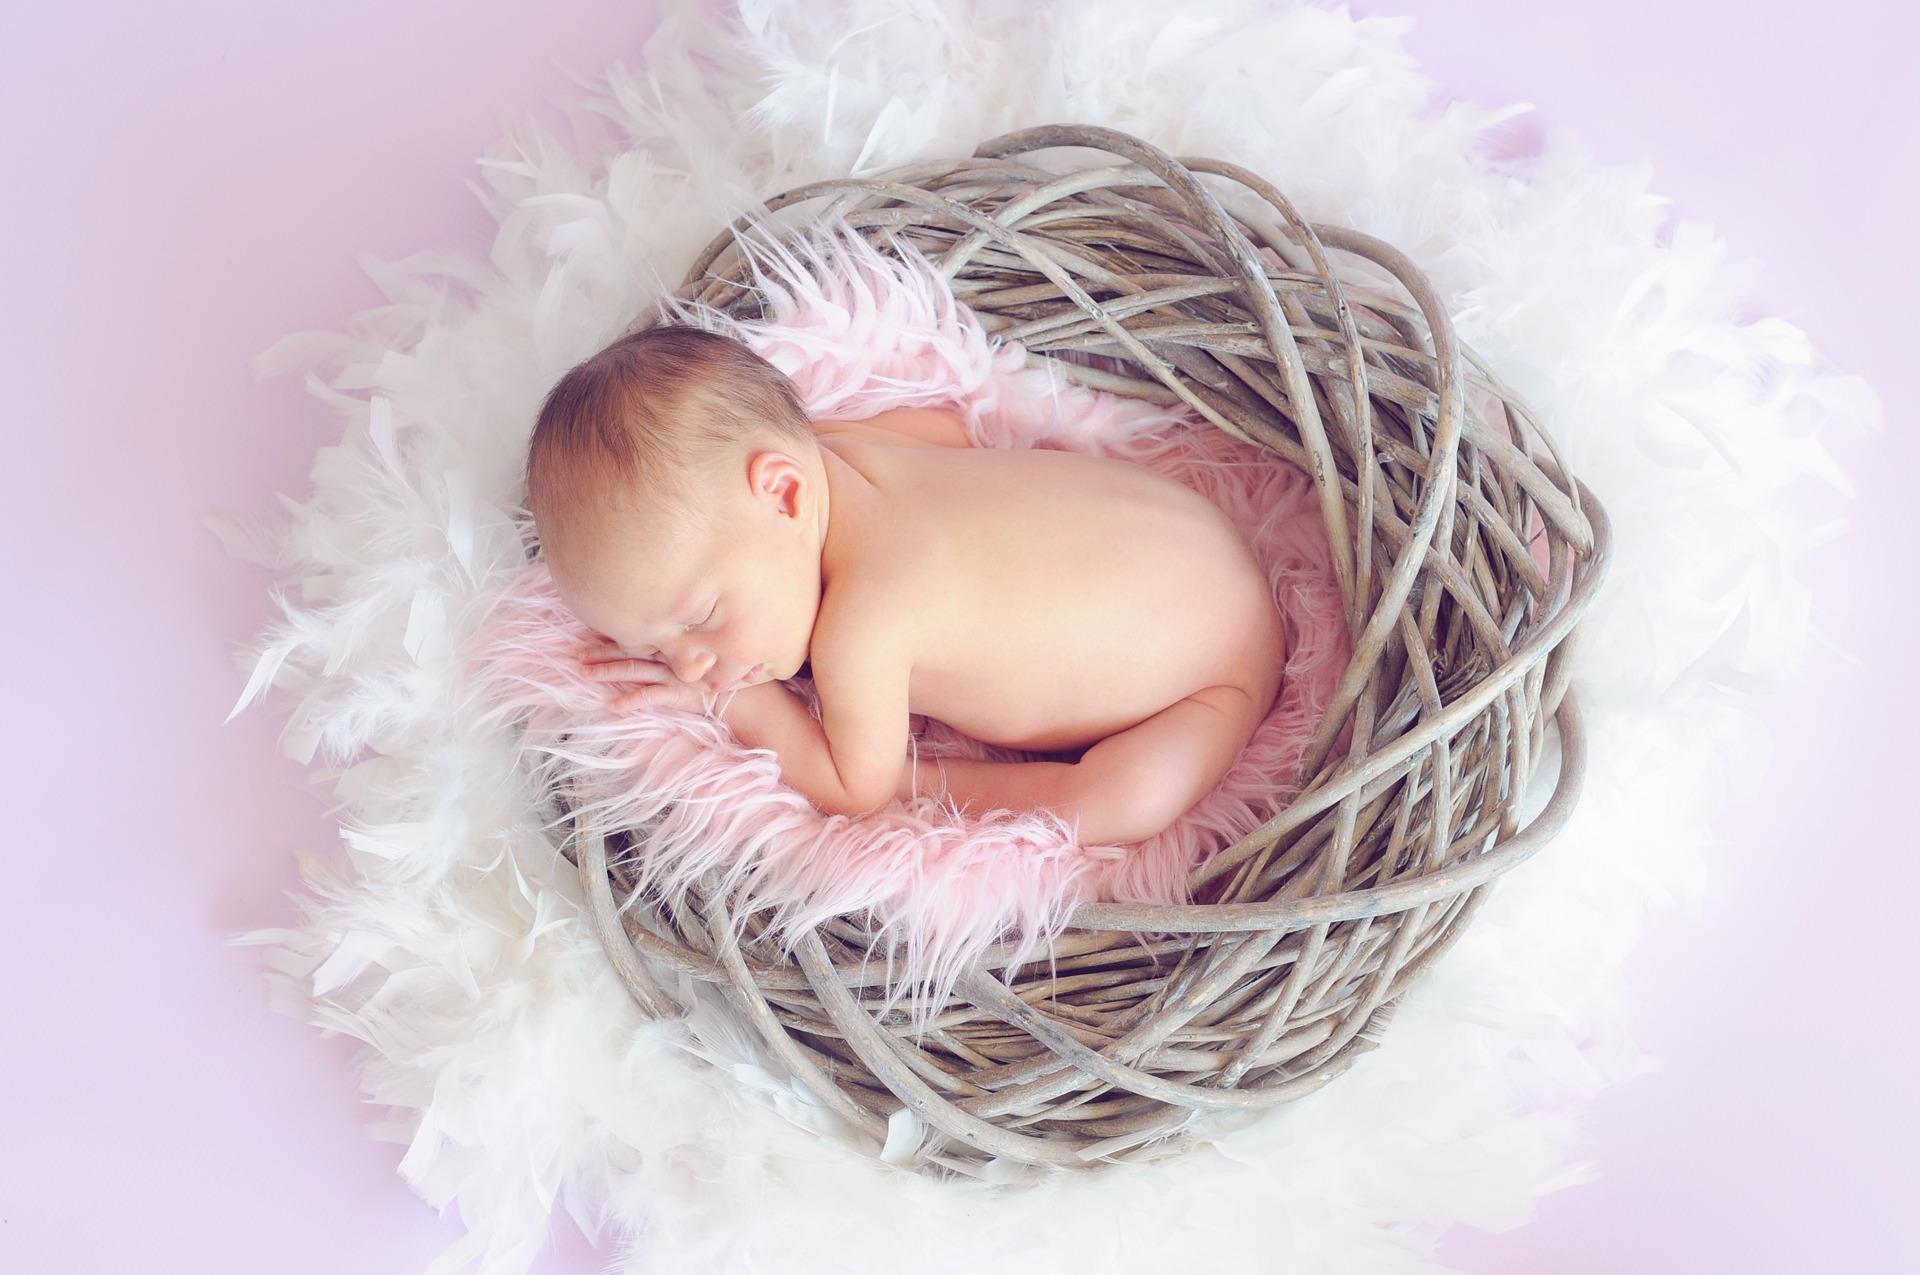 baby-784608_1920.jpg